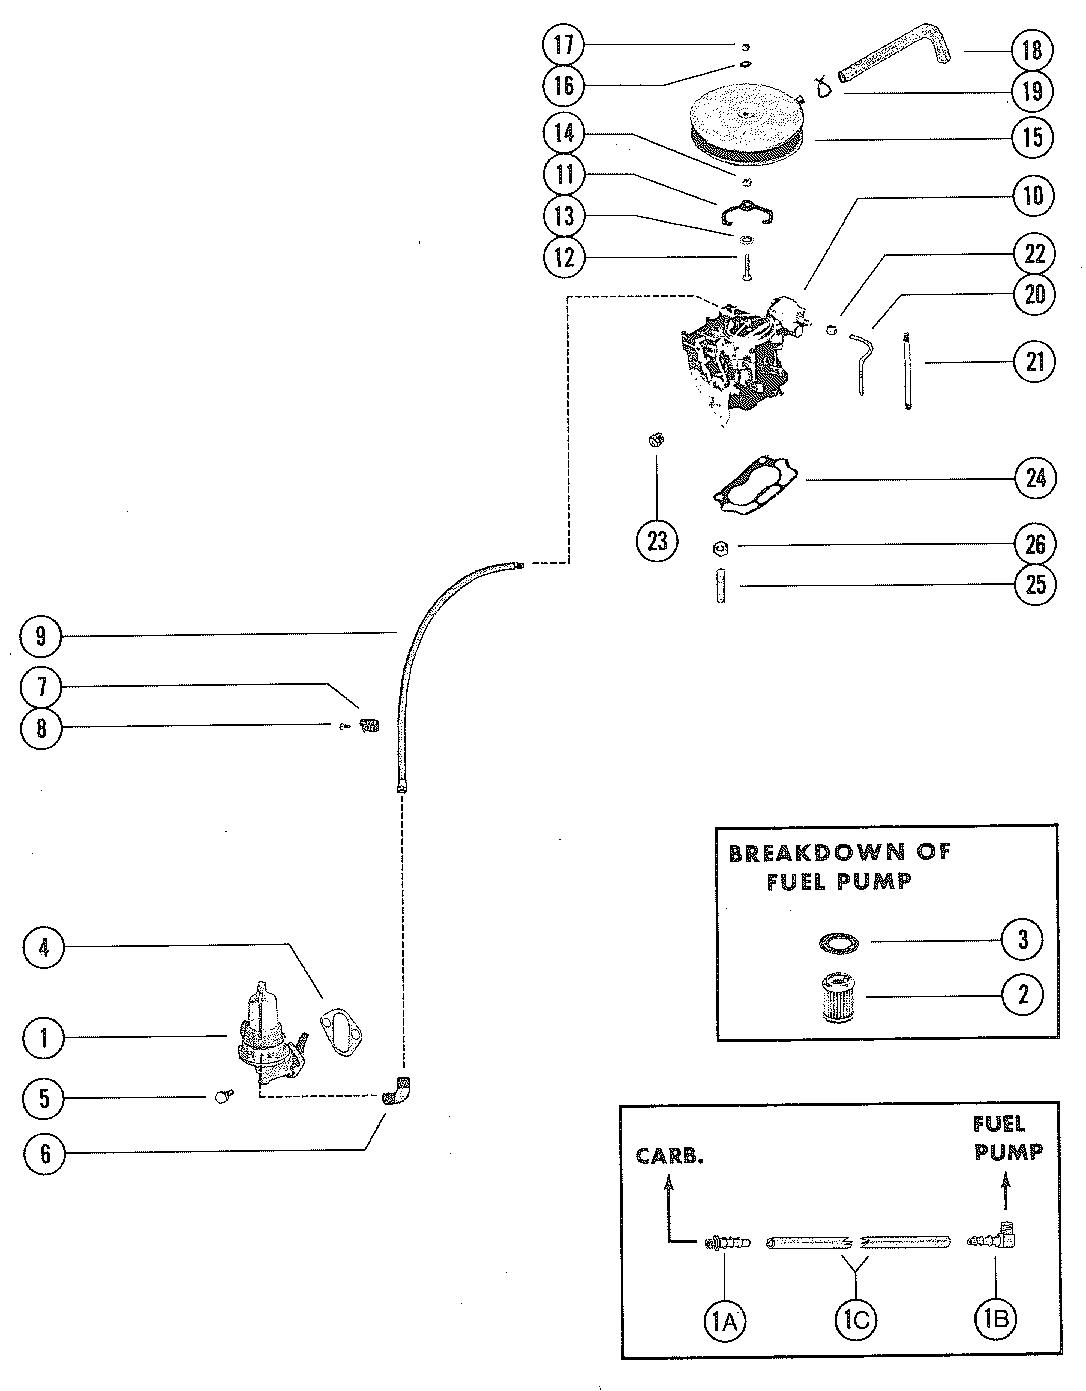 fuel pump  fuel filter and carburetor for mercruiser 140